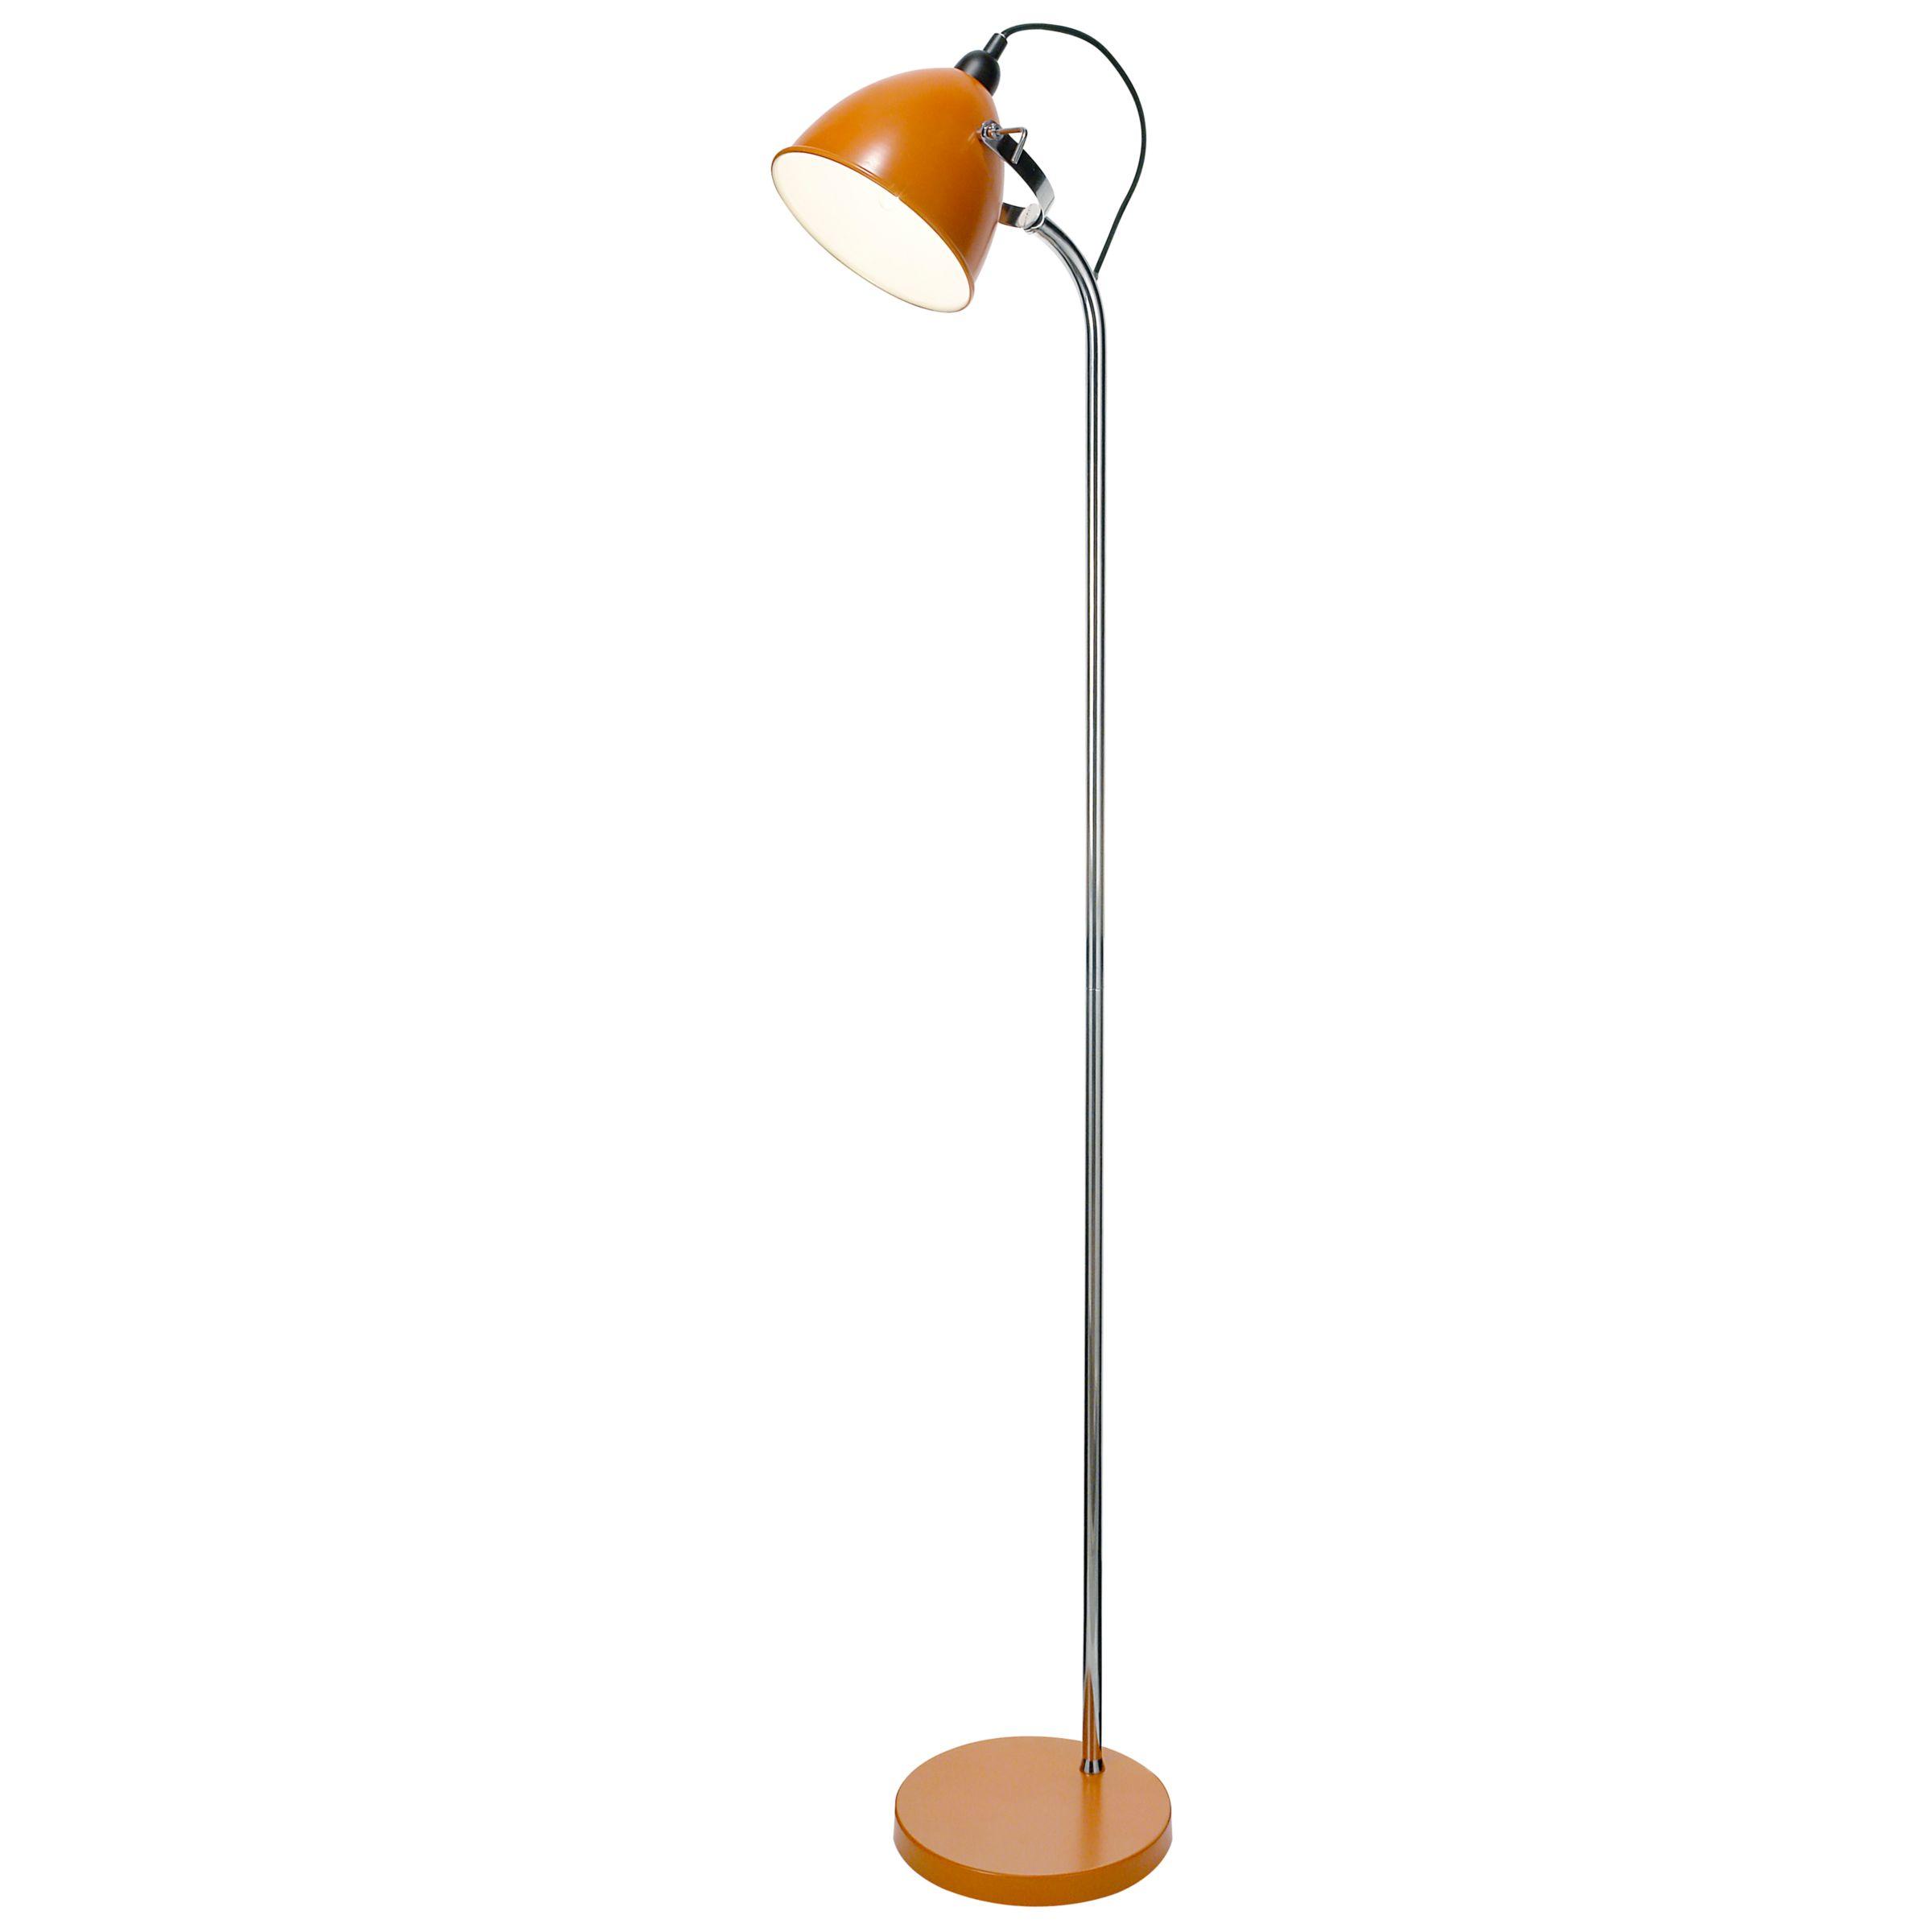 John lewis rochelle floor lamp orange review compare for Orange metal floor lamp